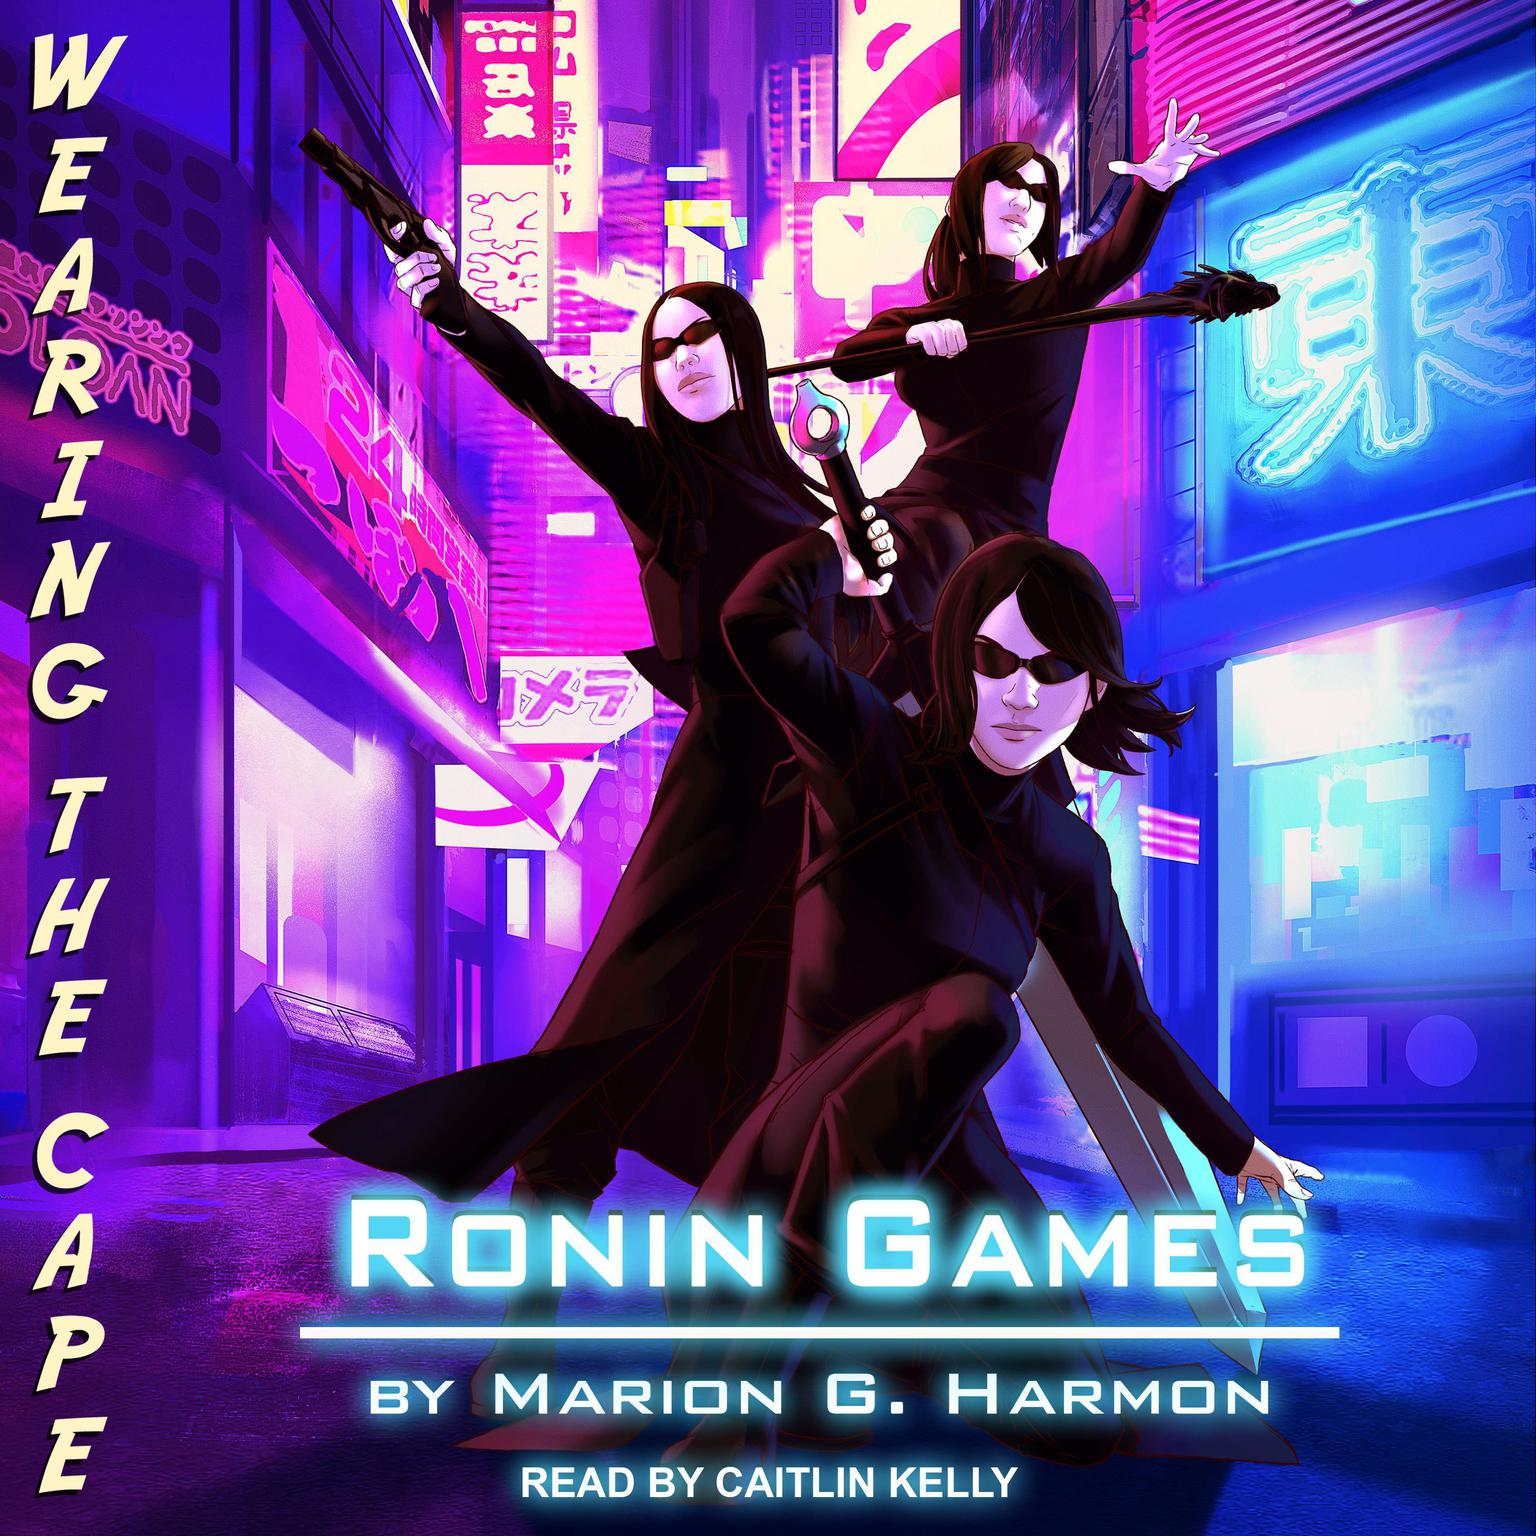 Printable Ronin Games Audiobook Cover Art